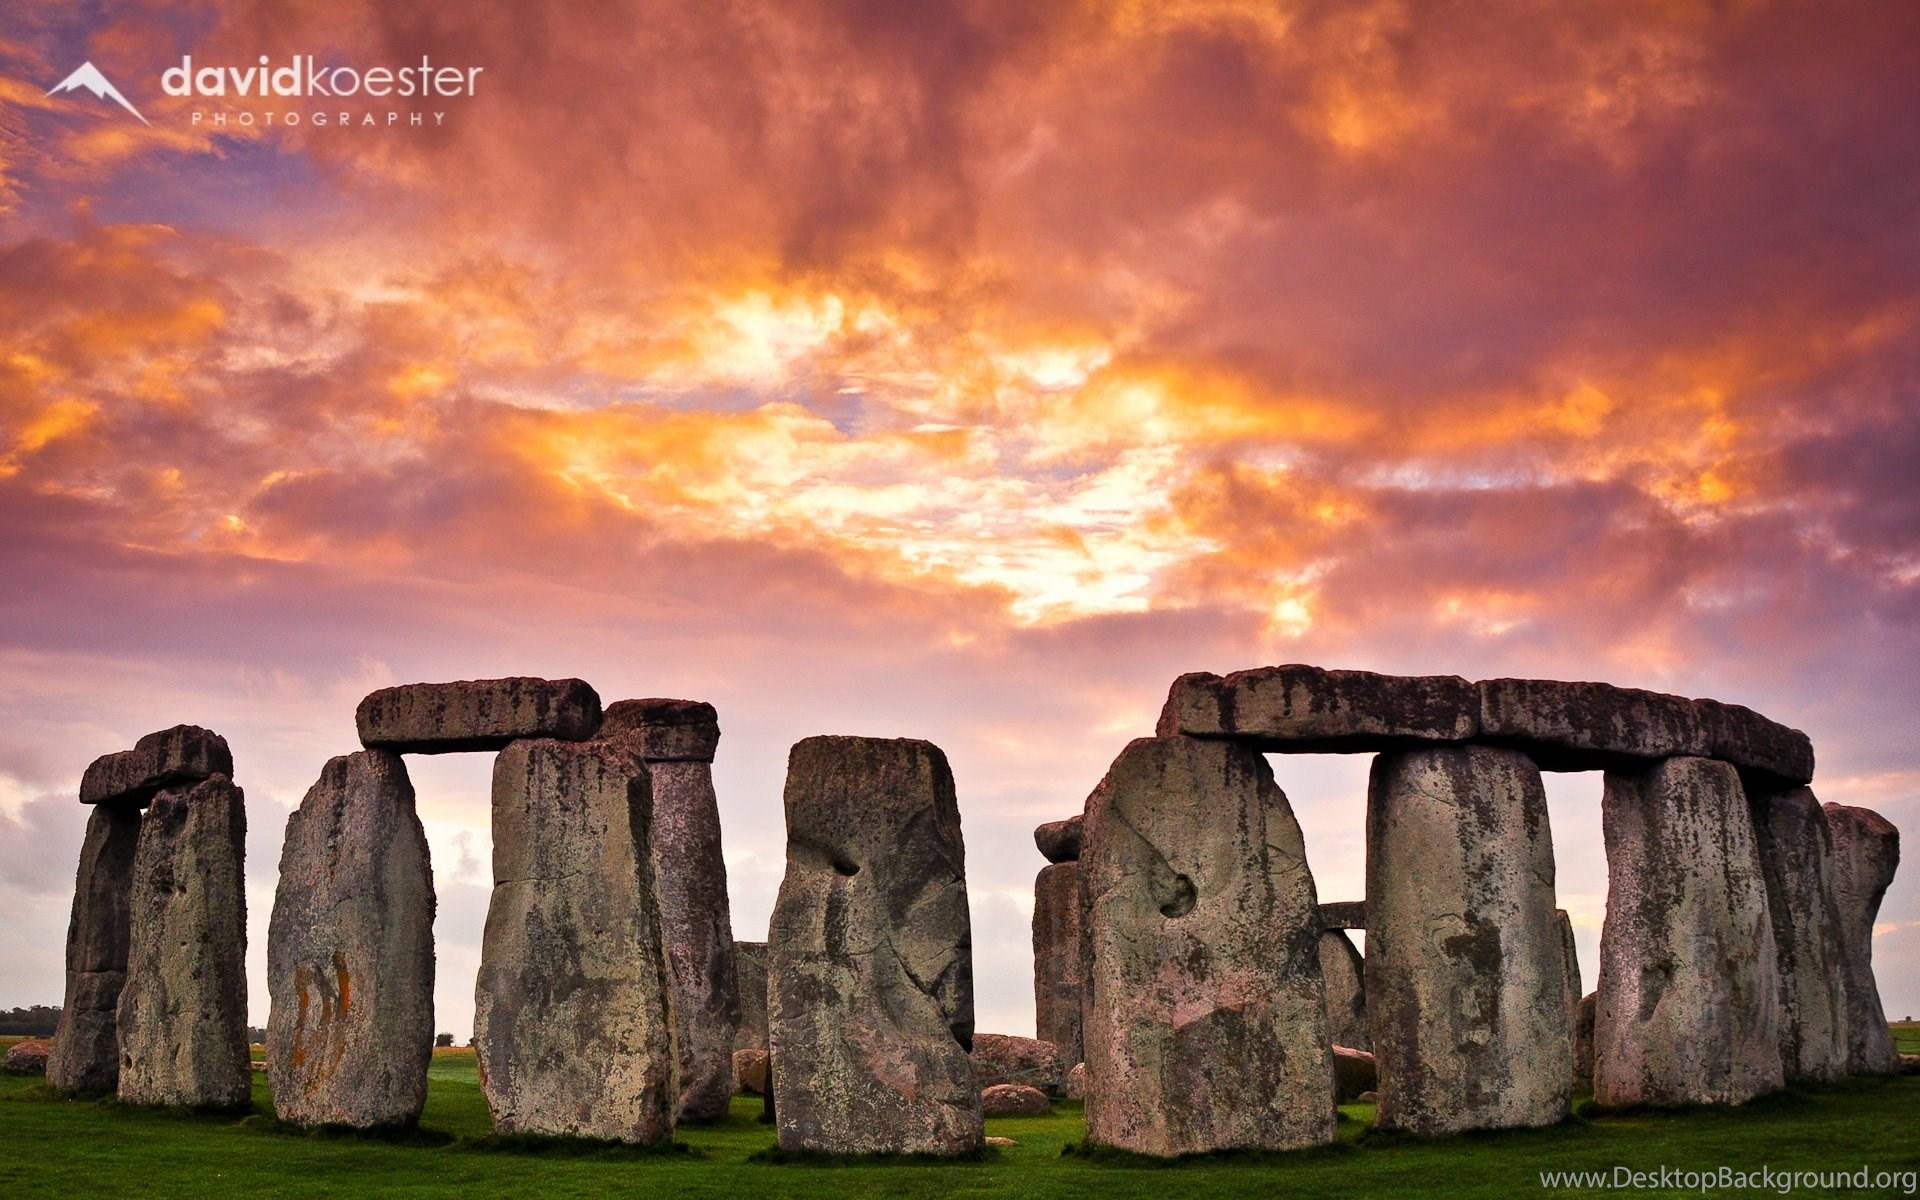 Famous Rock Group, Stonehenge, Wiltshire, England  № 715585 бесплатно